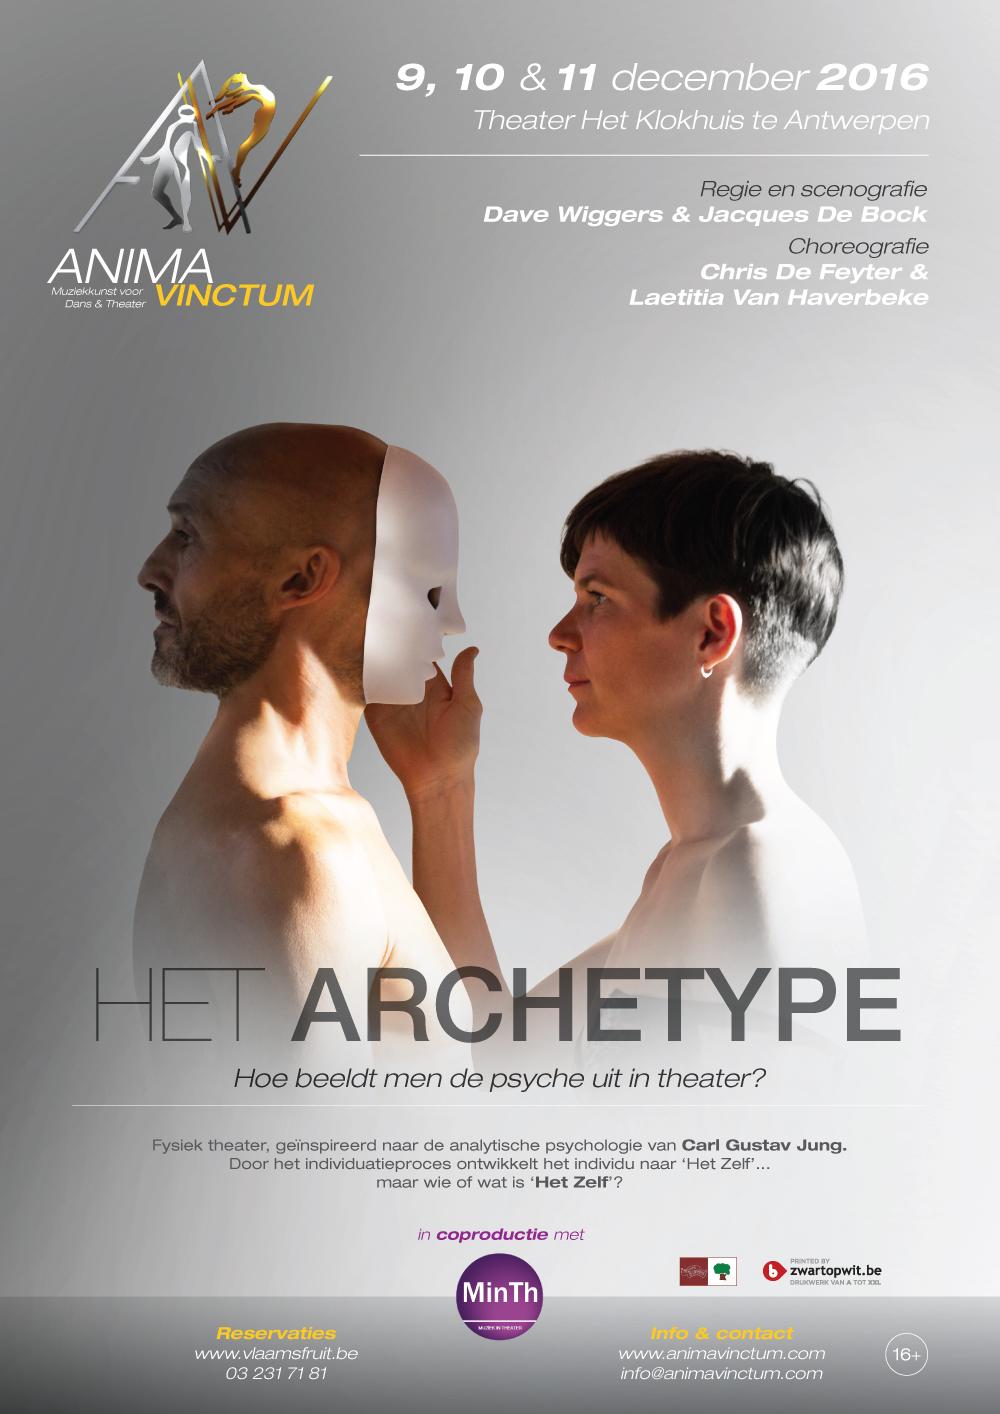 theaterproducties anima vinctum het archetype affiche